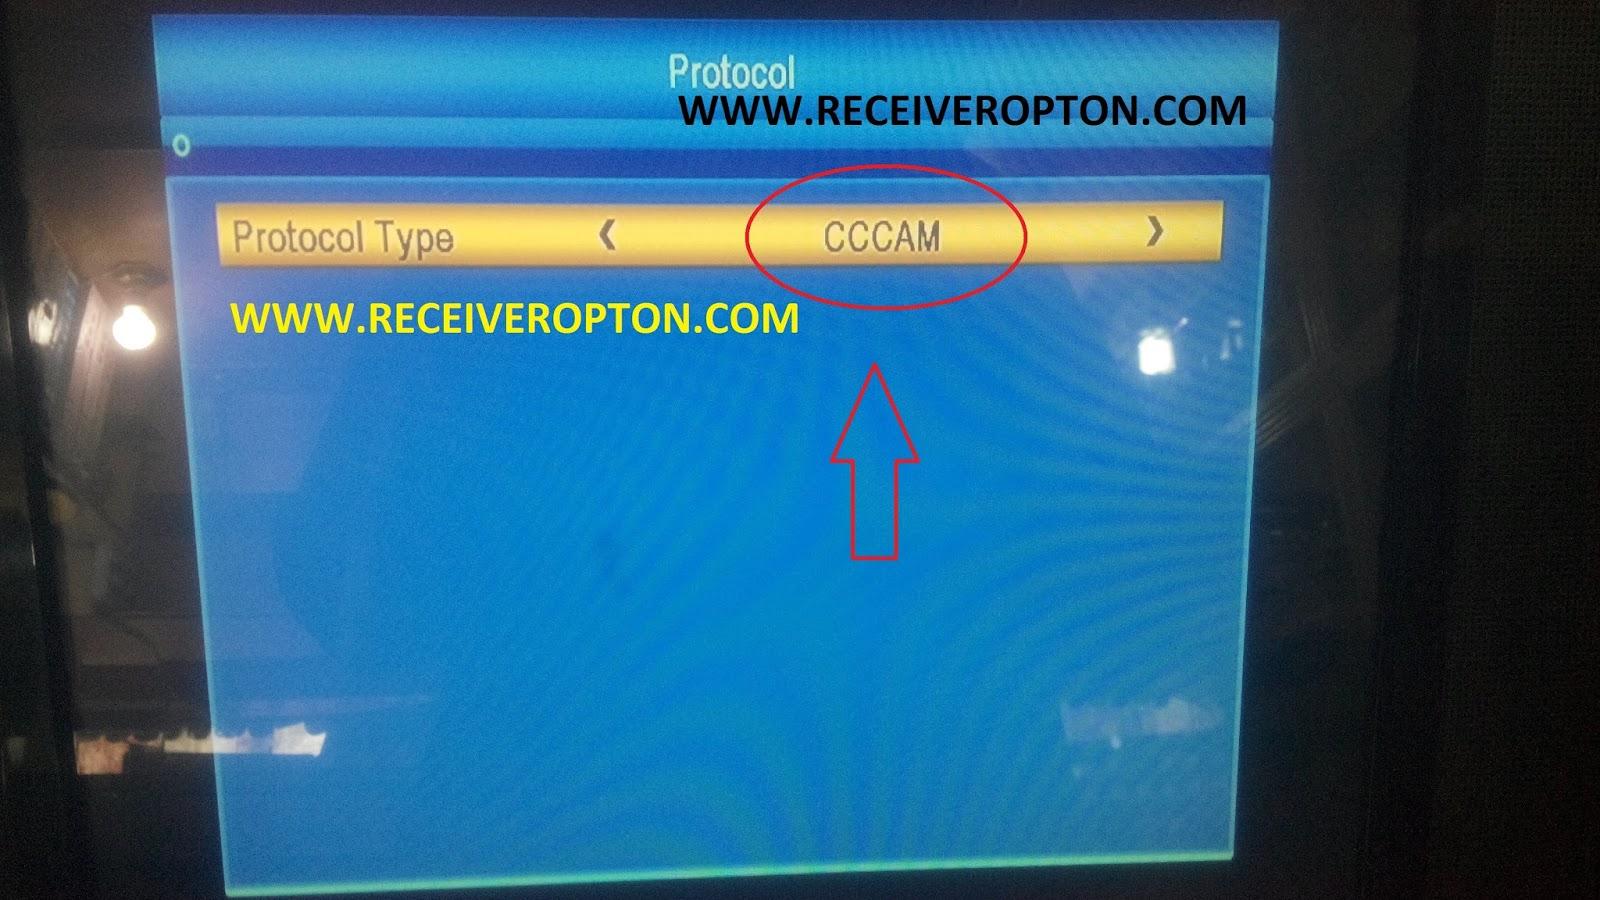 NEOSAT I-5000 HD RECEIVER CCCAM OPTION - HOW TO ENTER BISS